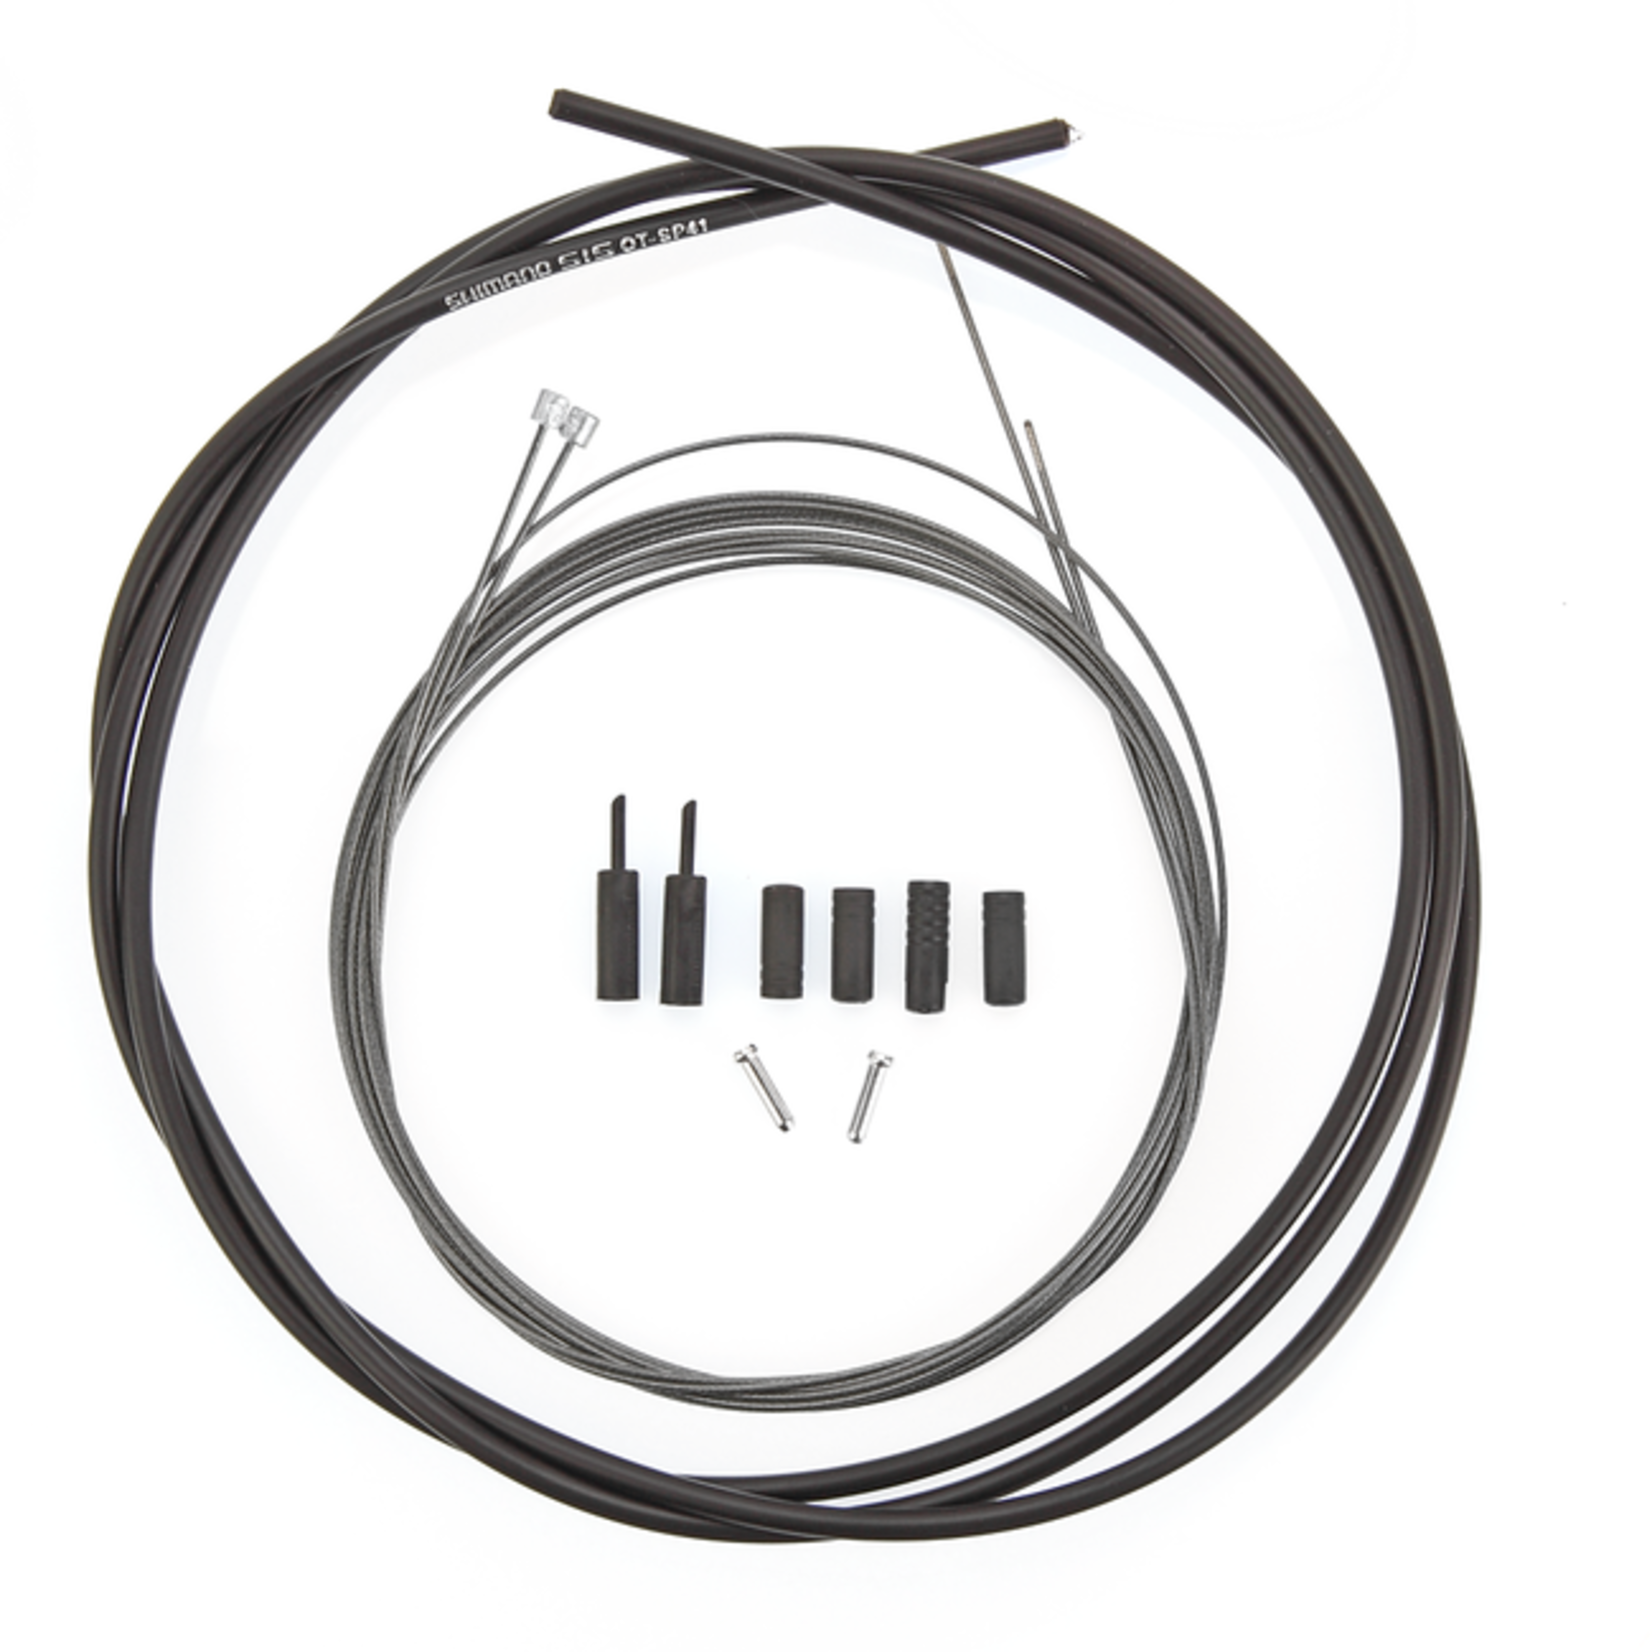 Shimano ROAD OPTISLICK SHIFT CABLE SET - BLACK